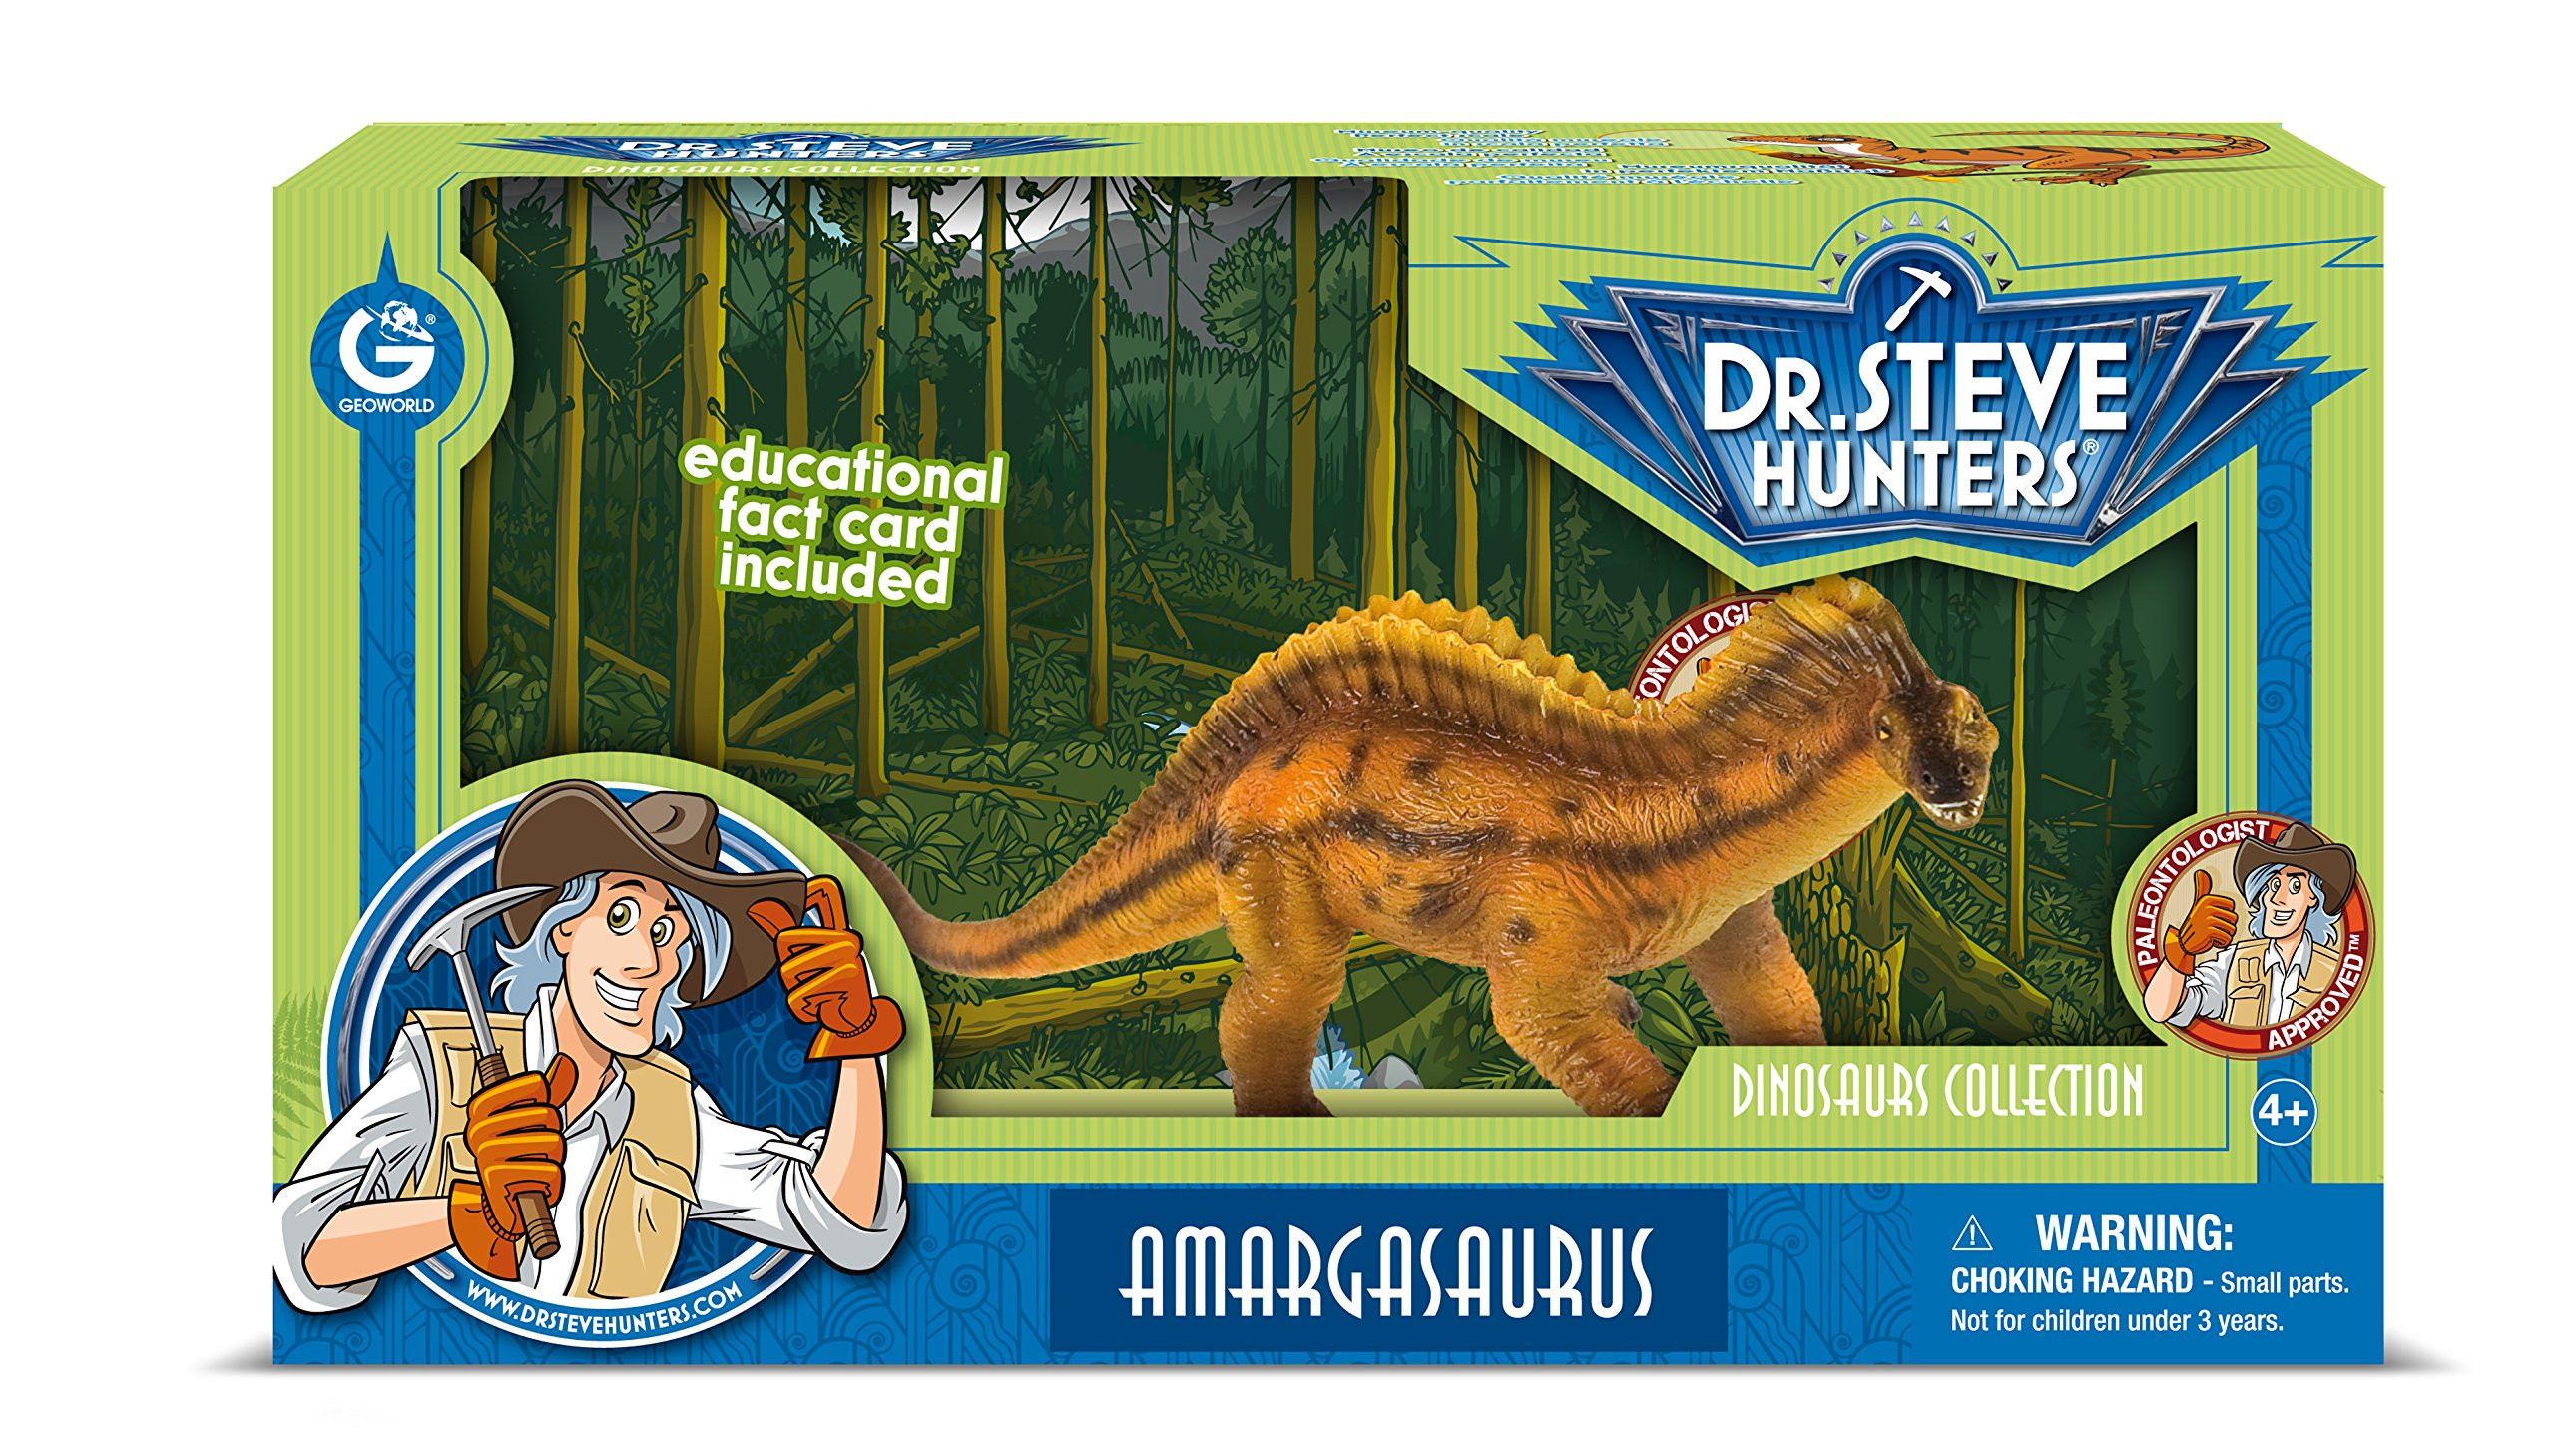 Dr. Steve Hunters cl1560K-Collection of Dinosaurs: Model Amargasaurus